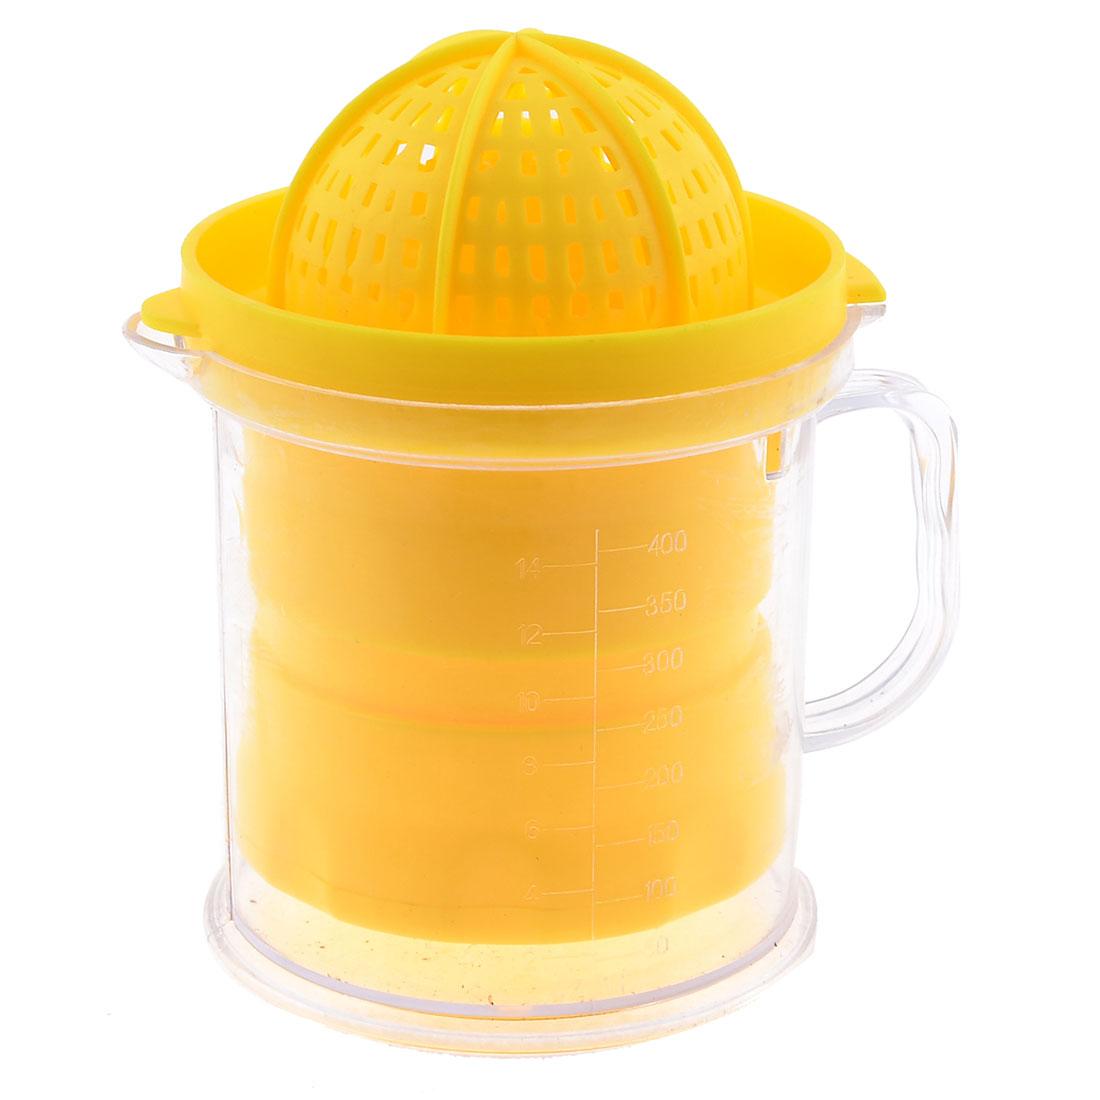 Fruits Citrus Orange Press Squeezer Yellow Clear Plastic Manual Juicer 400ML